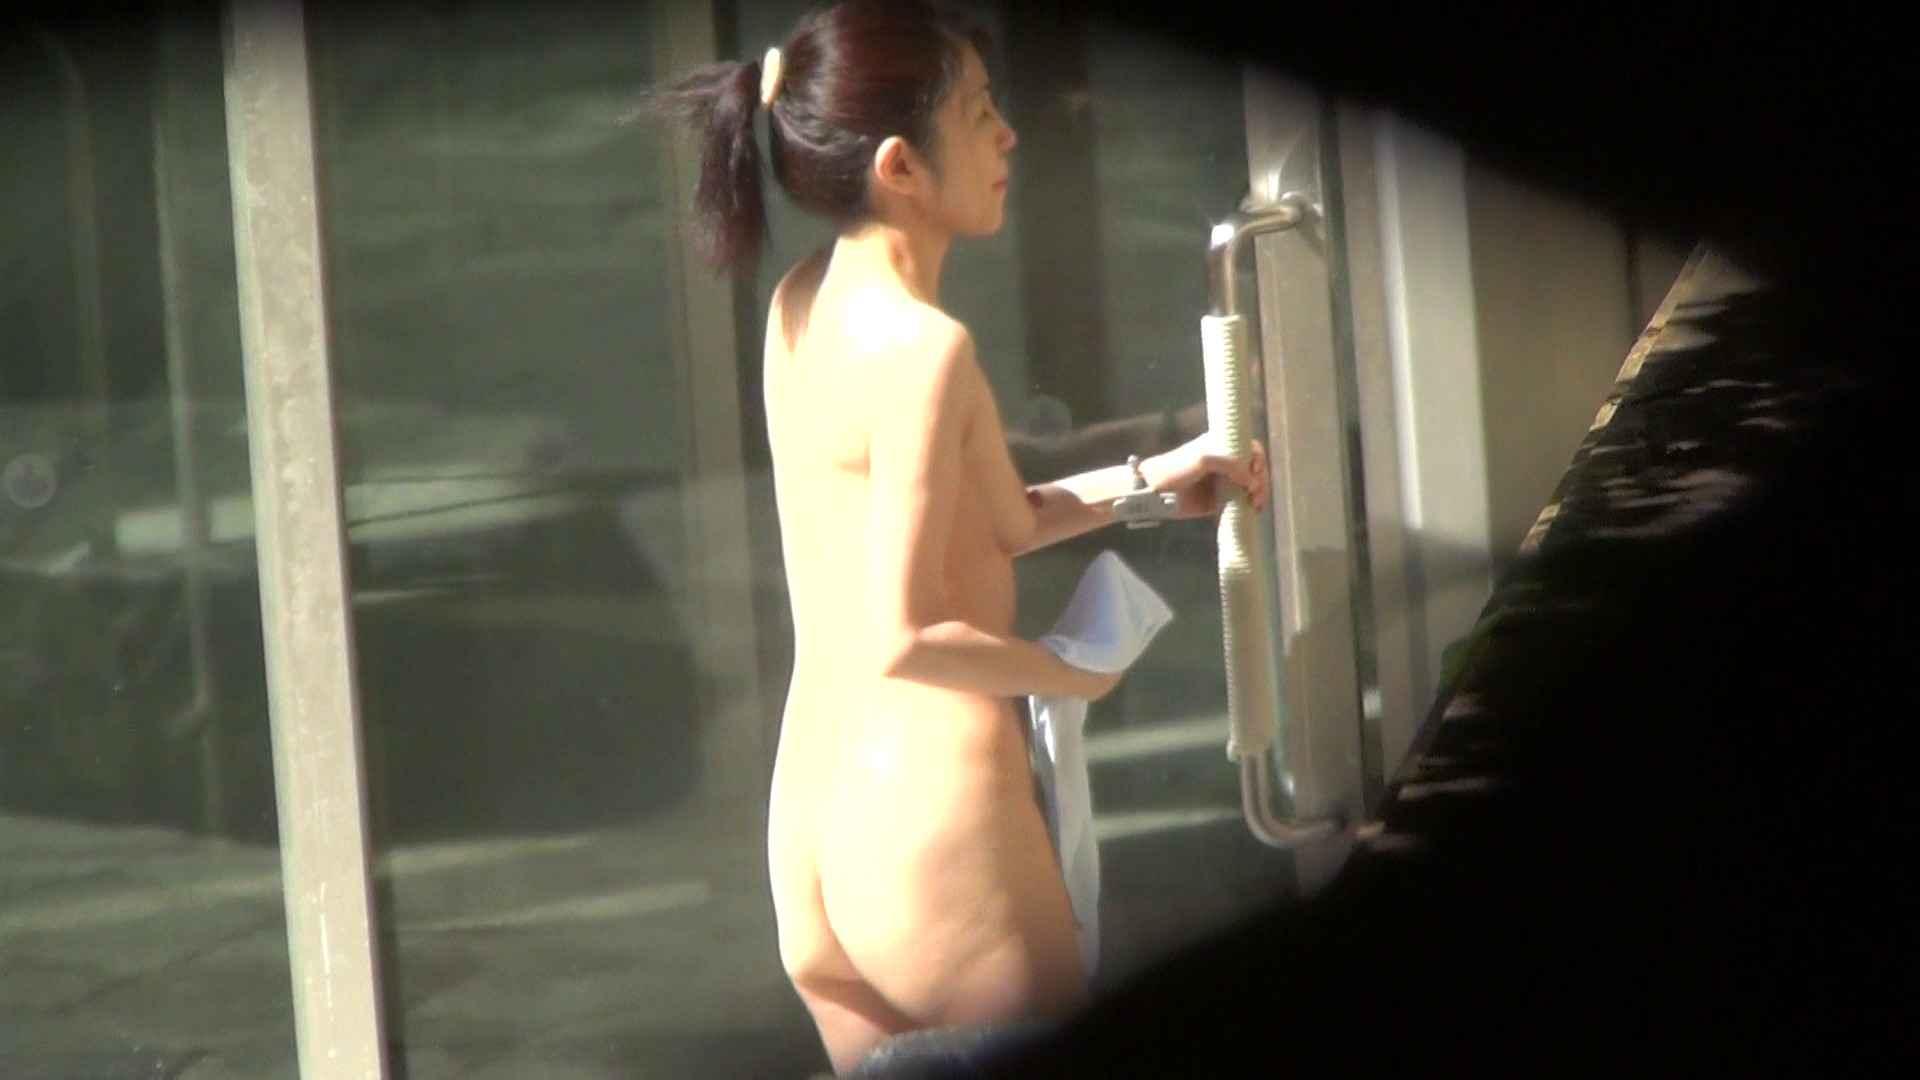 Vol.81 【閲覧注意】極熟肉オンパレード! エッチすぎる美女 オマンコ無修正動画無料 36連発 2